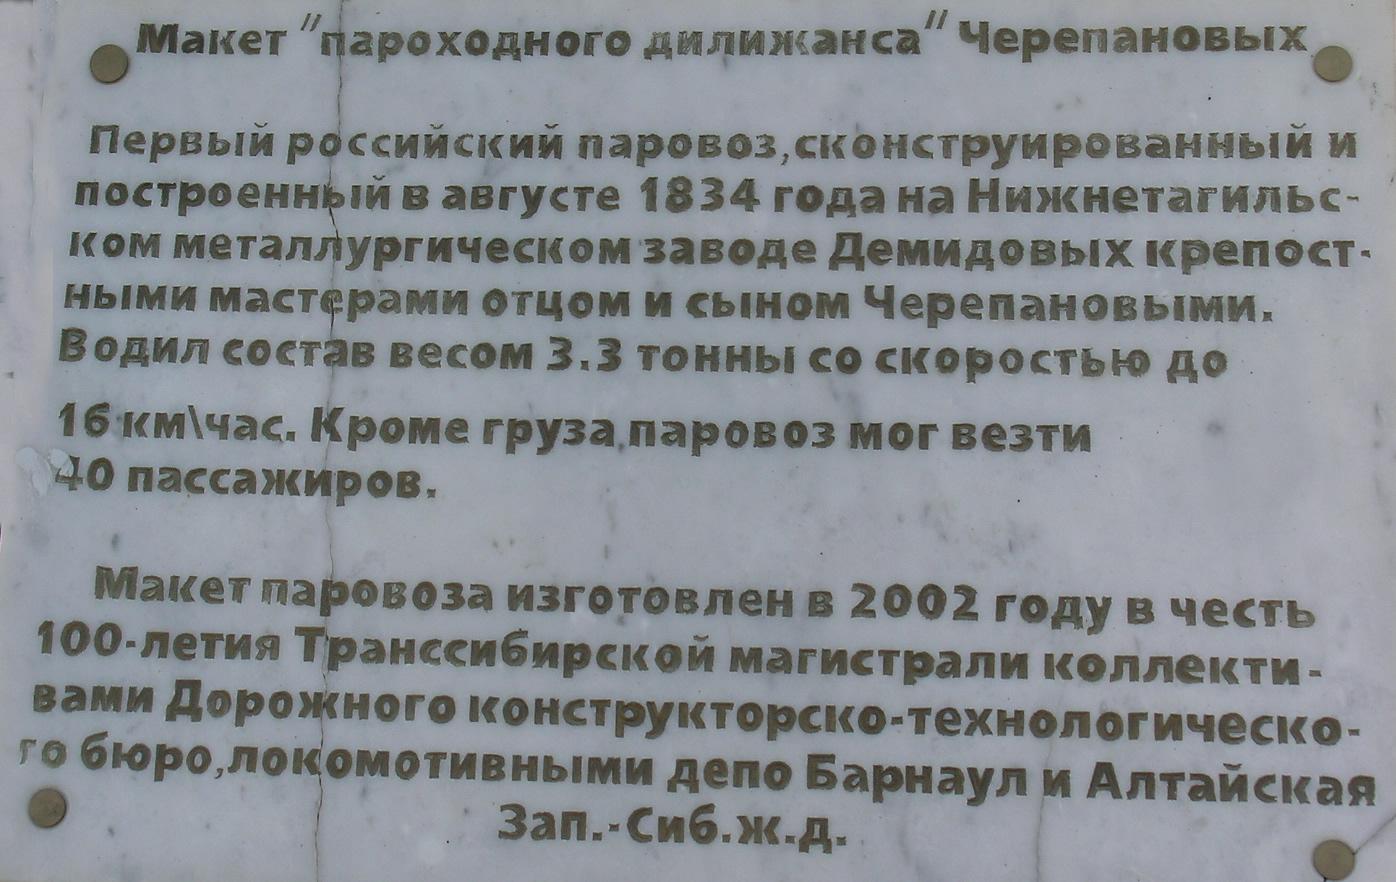 http://www.peshtour.ru/images/NSK54/muzeiZHd1.jpg